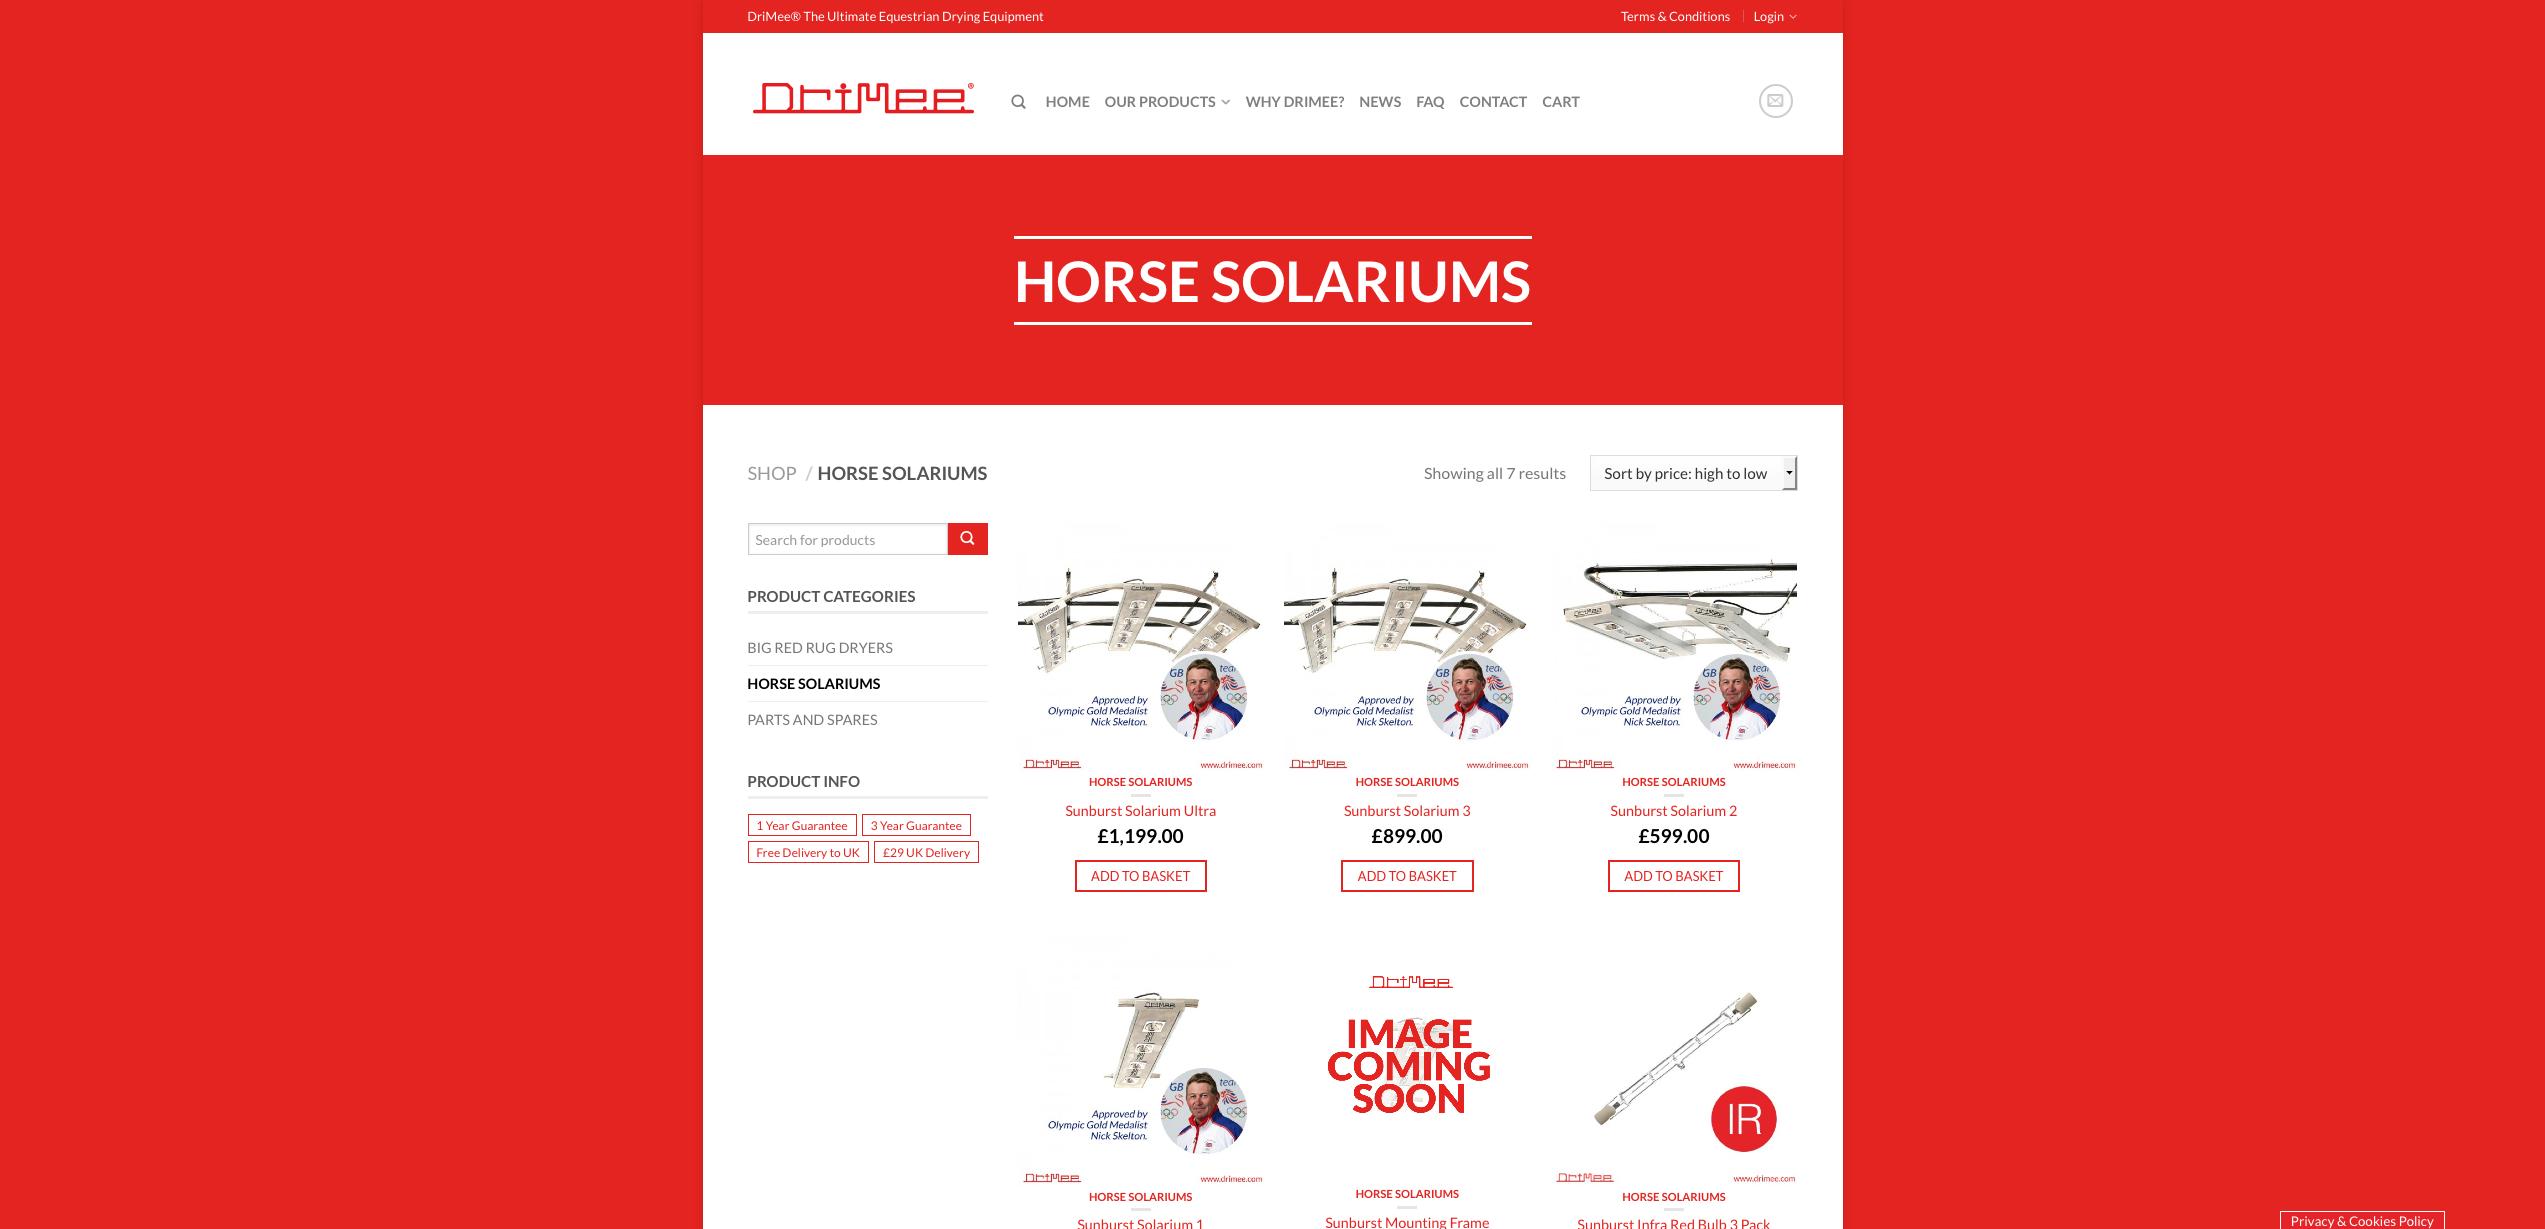 IDEA UK Design and Marketing Drimee Equestrian Horse Equipment Website Design 5